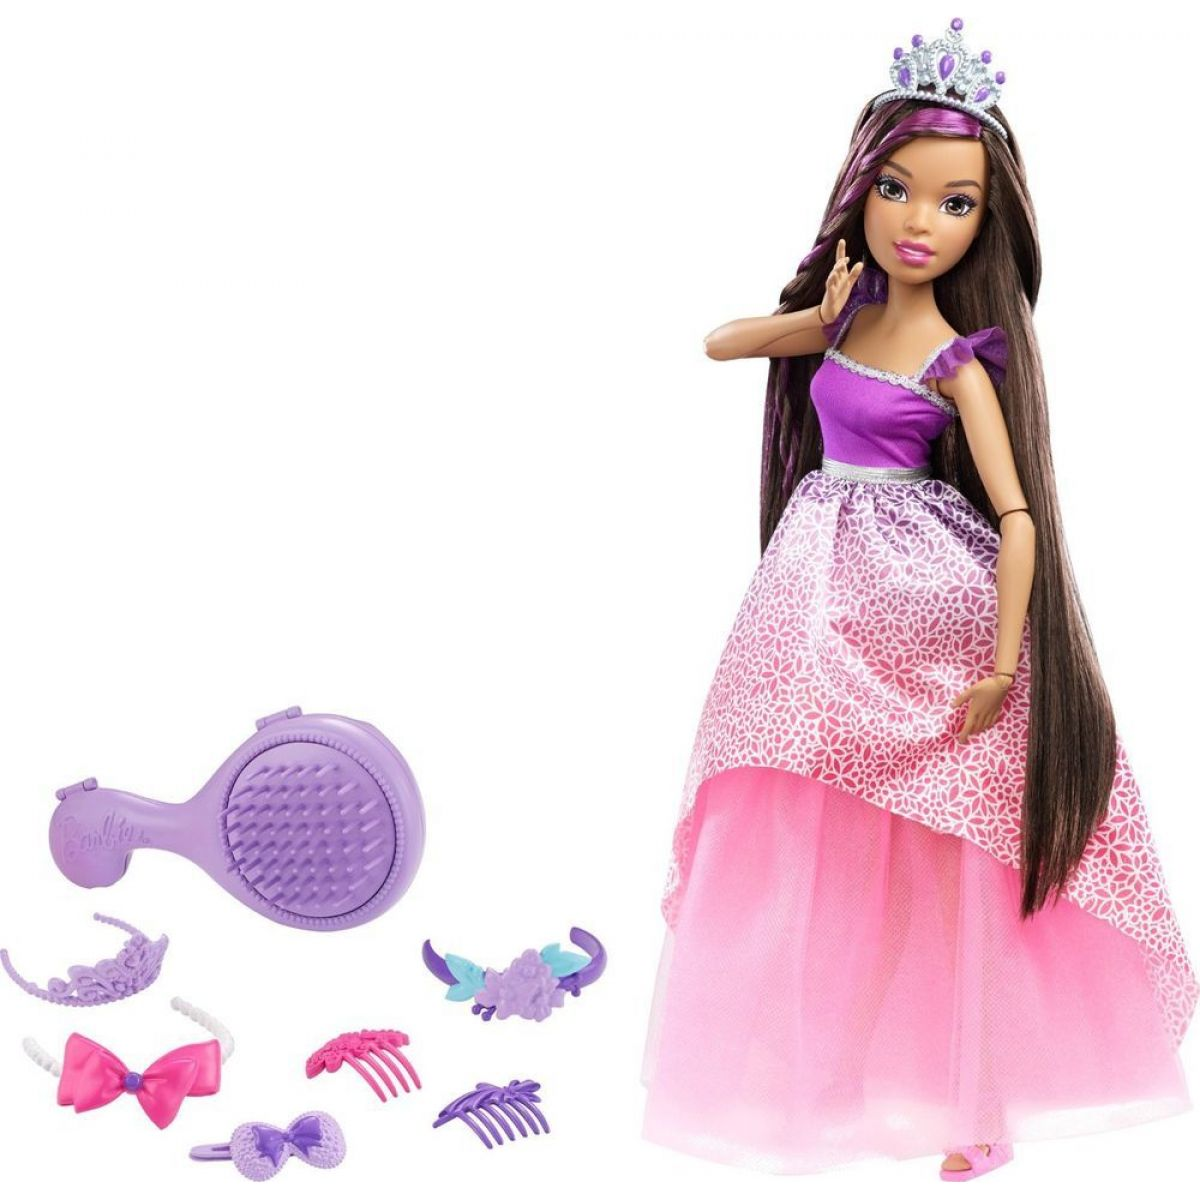 Barbie Vysoká princezná s dlhými vlasmi brunetka